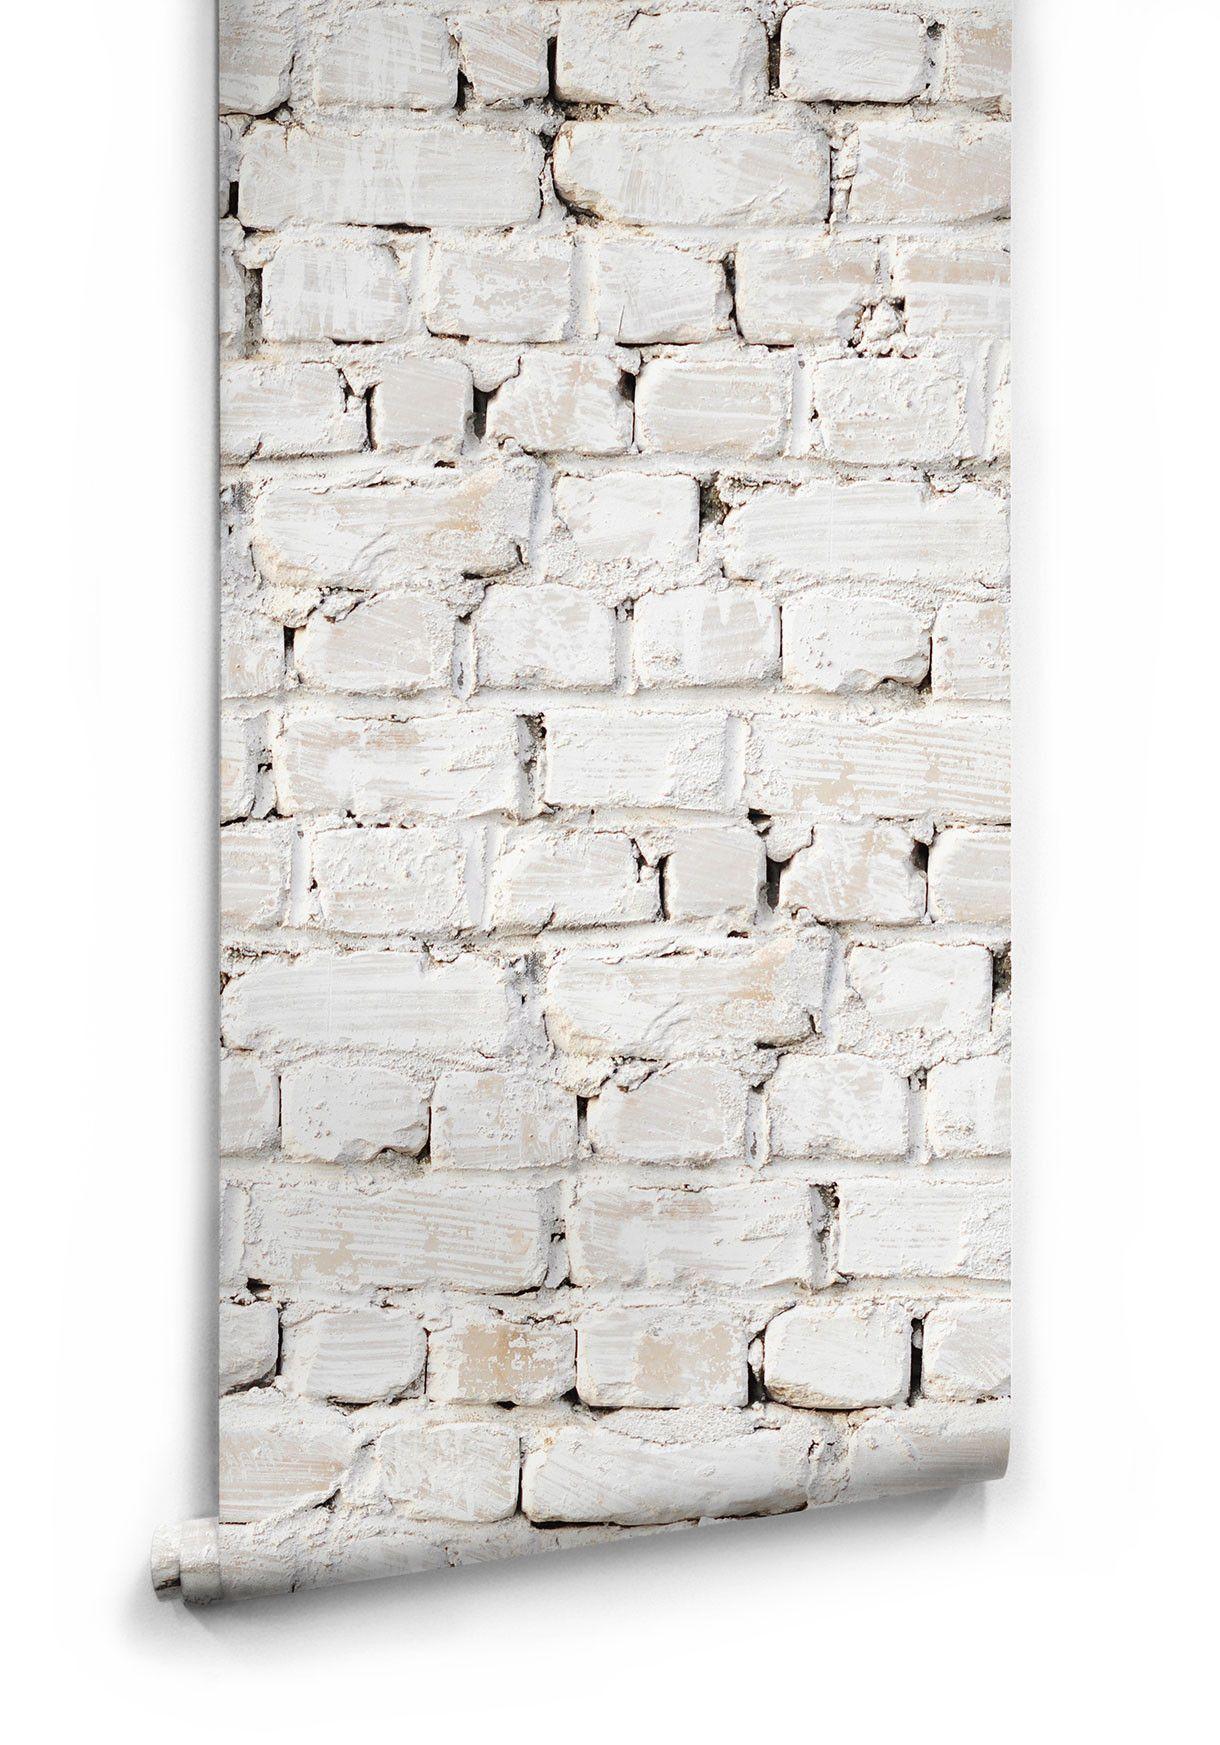 kitchen wallpaper designs Sample of Whitewash Bricks Boutique Faux Wallpaper design by Milton King